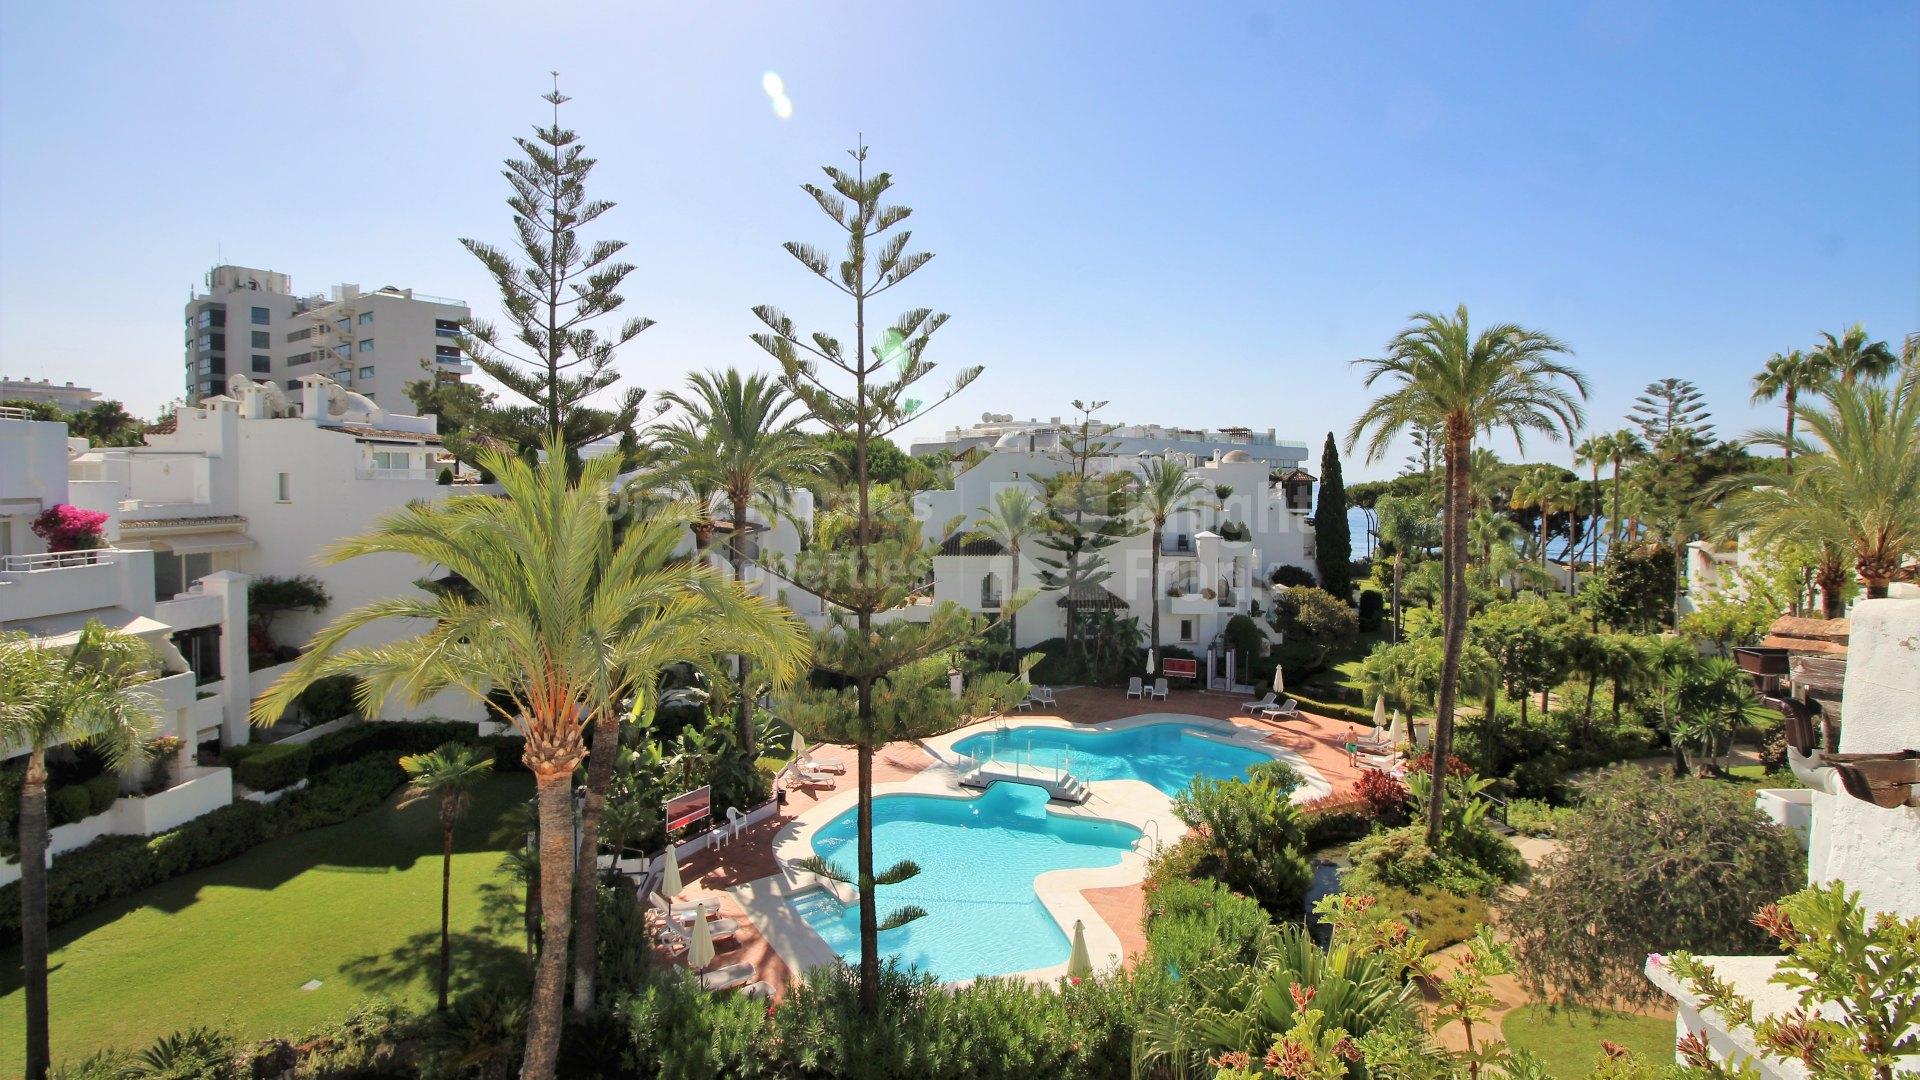 Duplex Penthouse In Beachside Development Duplex Penthouse For Sale In Alhambra Del Mar Marbella Golden Mile